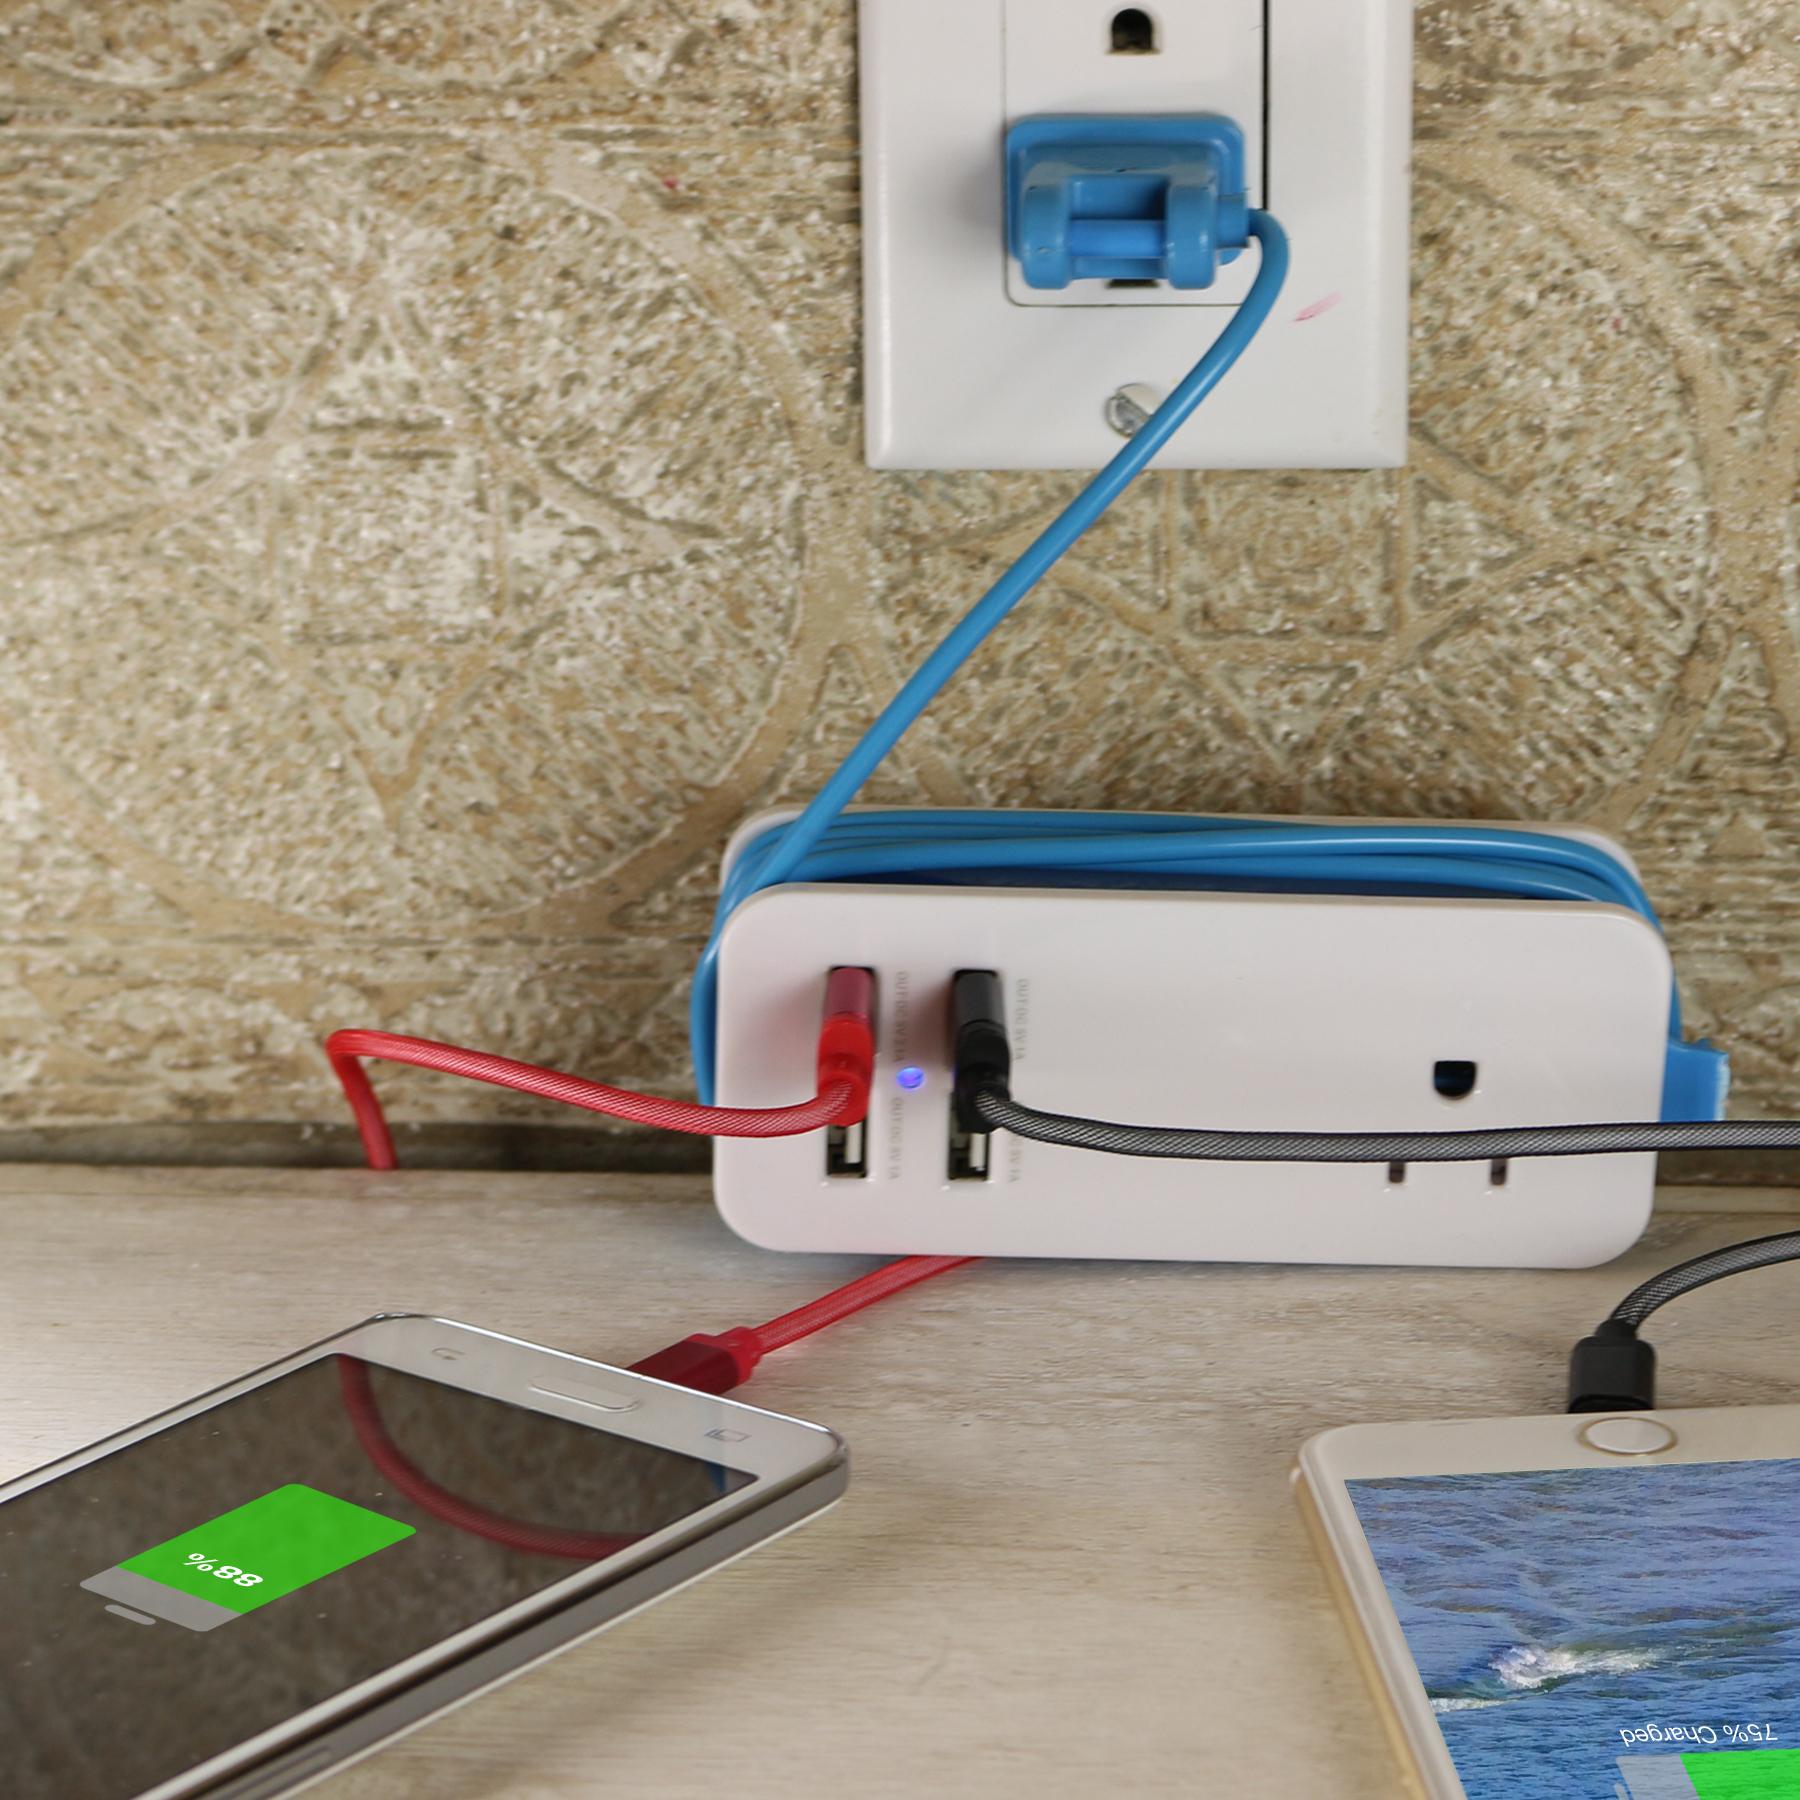 4200 MaH 4 Port USB Charging Station  amp  Universal Power Socket